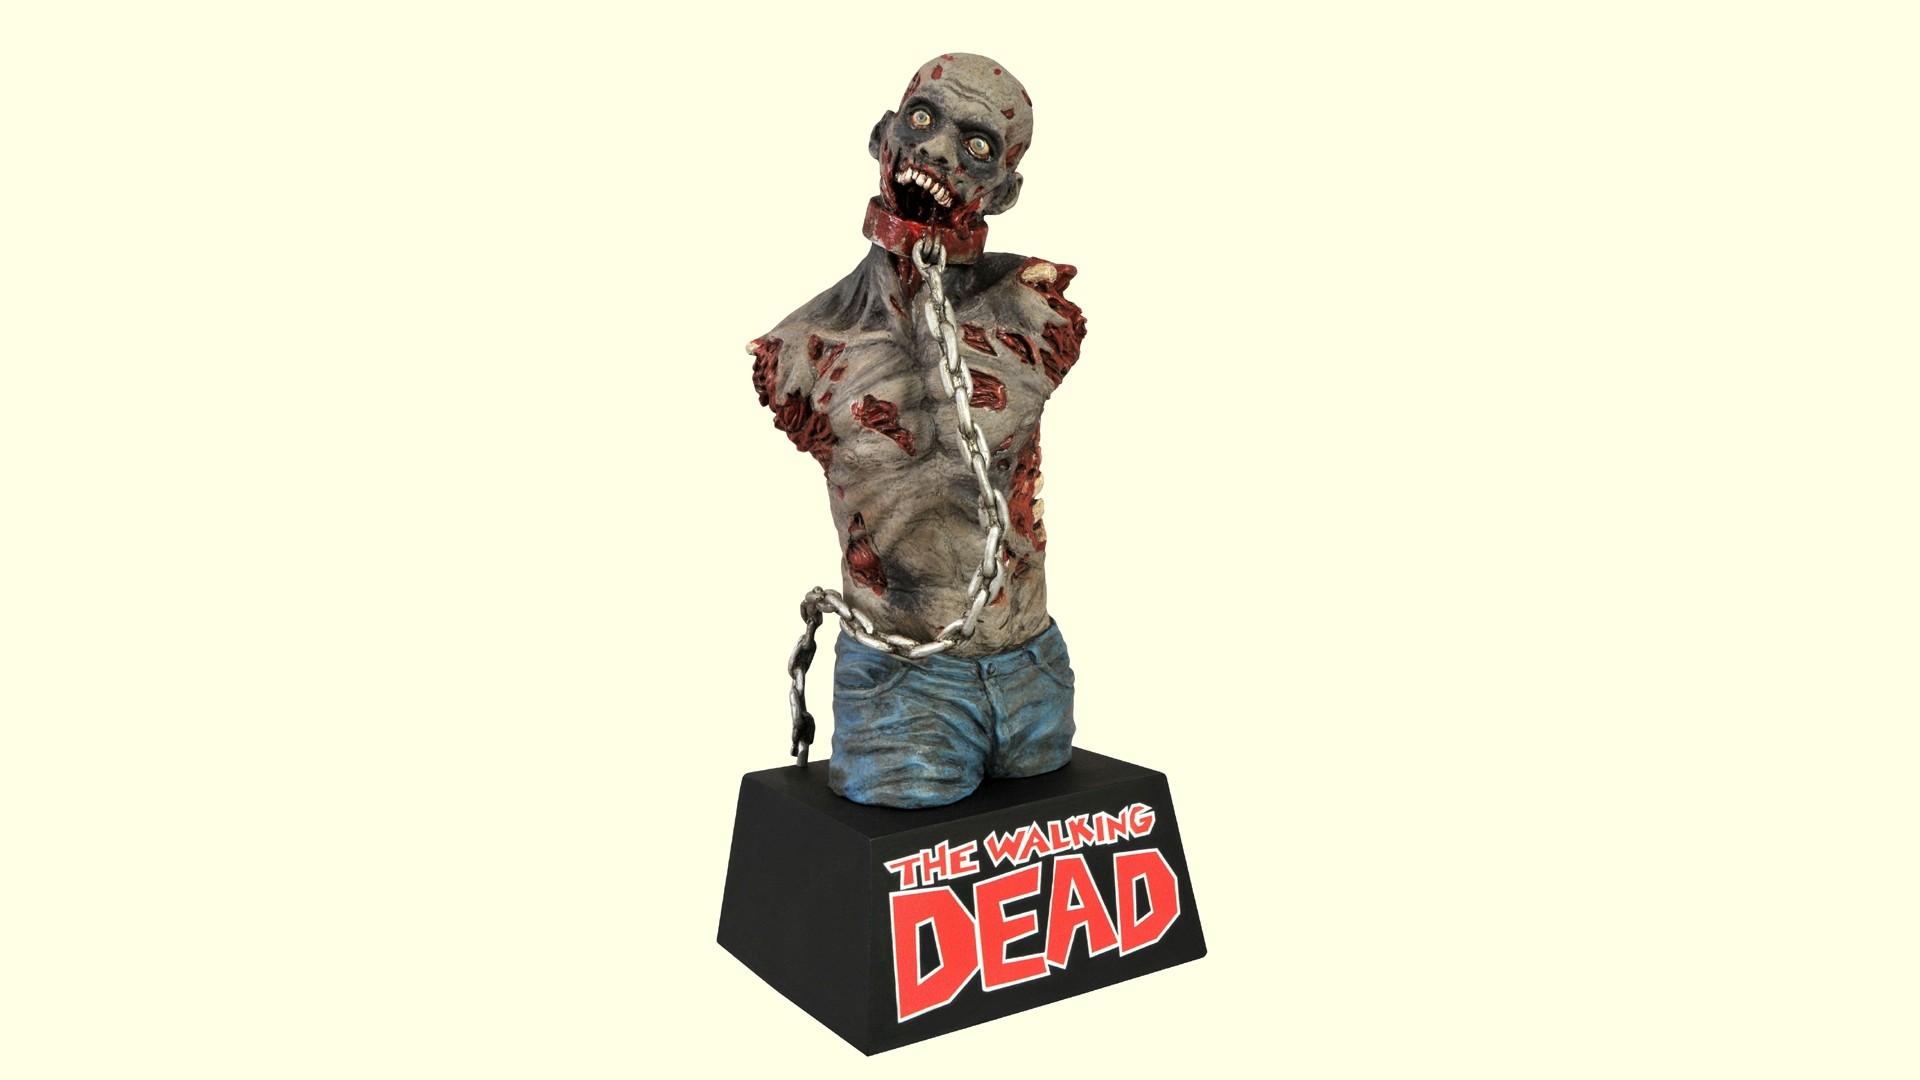 1920x1080 Walking Dead Comic Iphone Wallpaper